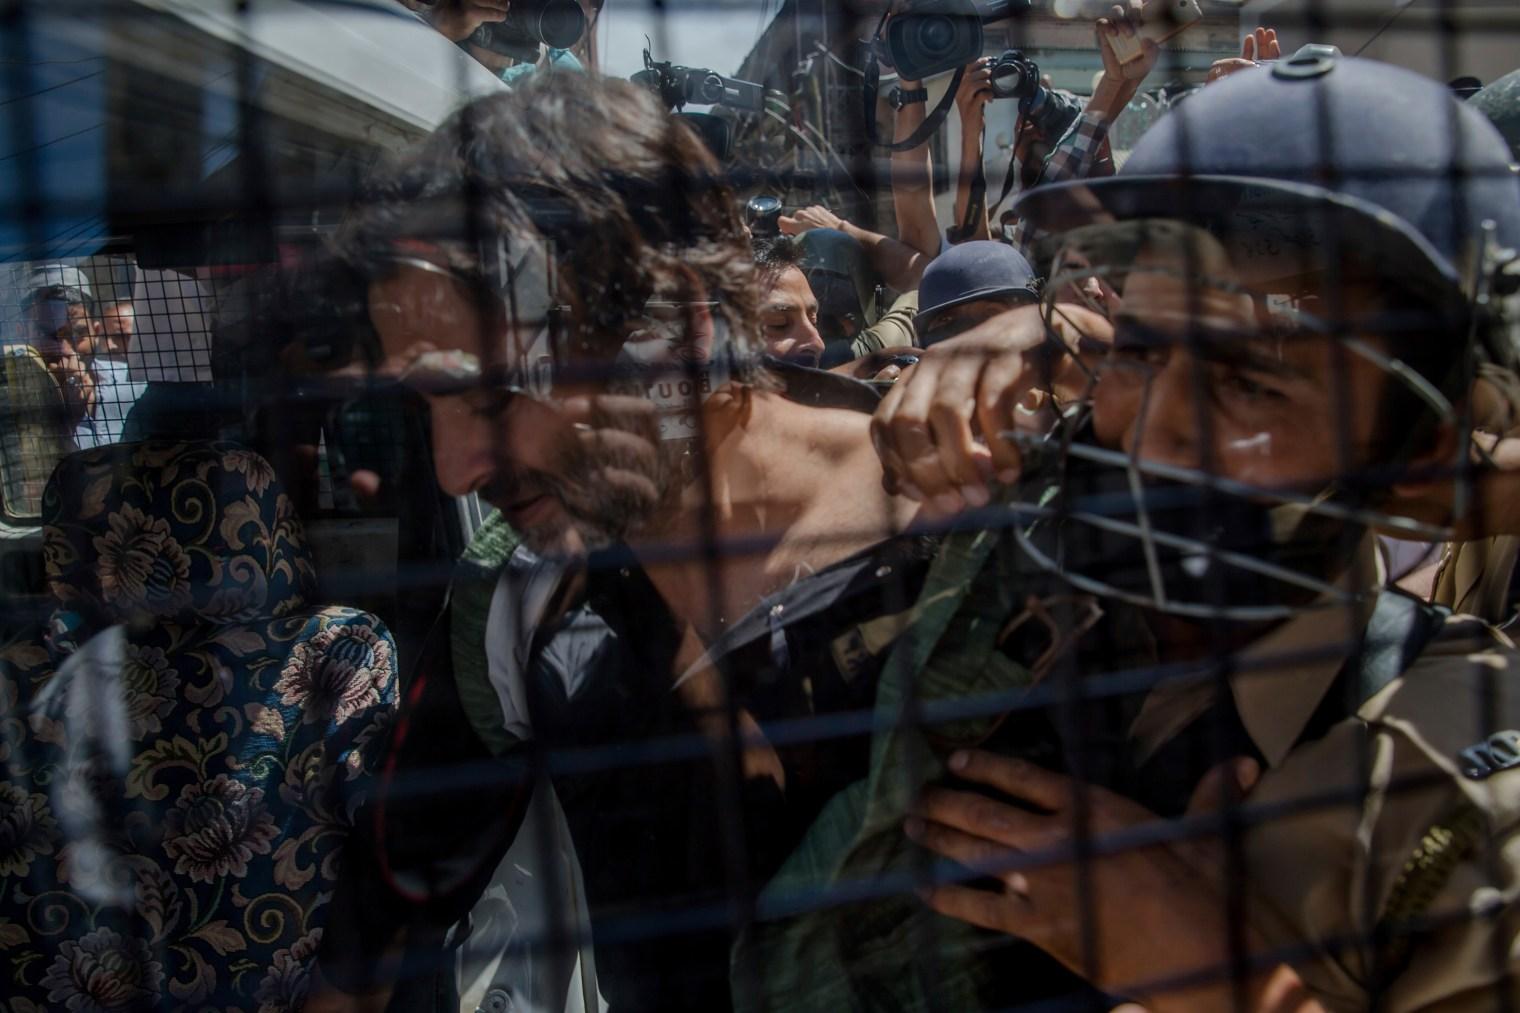 Indian policemen detain Jammu Kashmir Liberation Front (JKLF) Chairman Yasin Malik during a protest in Srinagar on June 9, 2017.